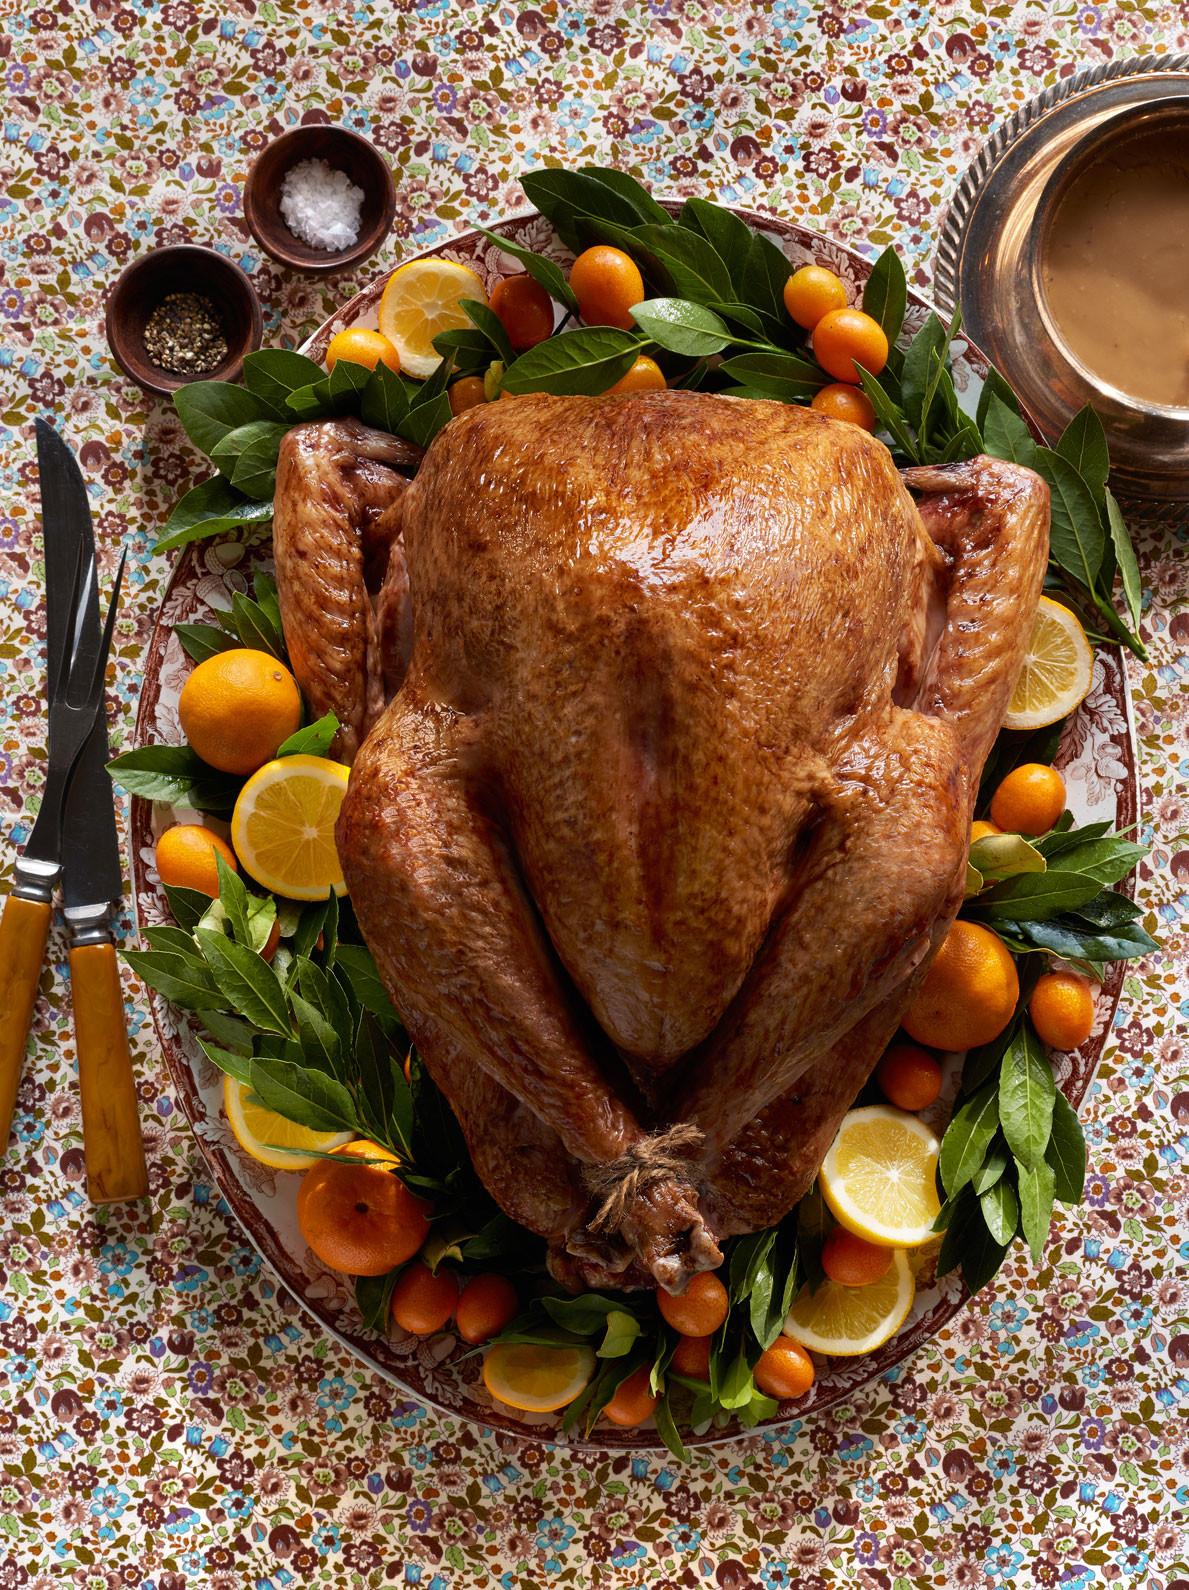 Thanksgiving Turkey Image  25 Best Thanksgiving Turkey Recipes How To Cook Turkey